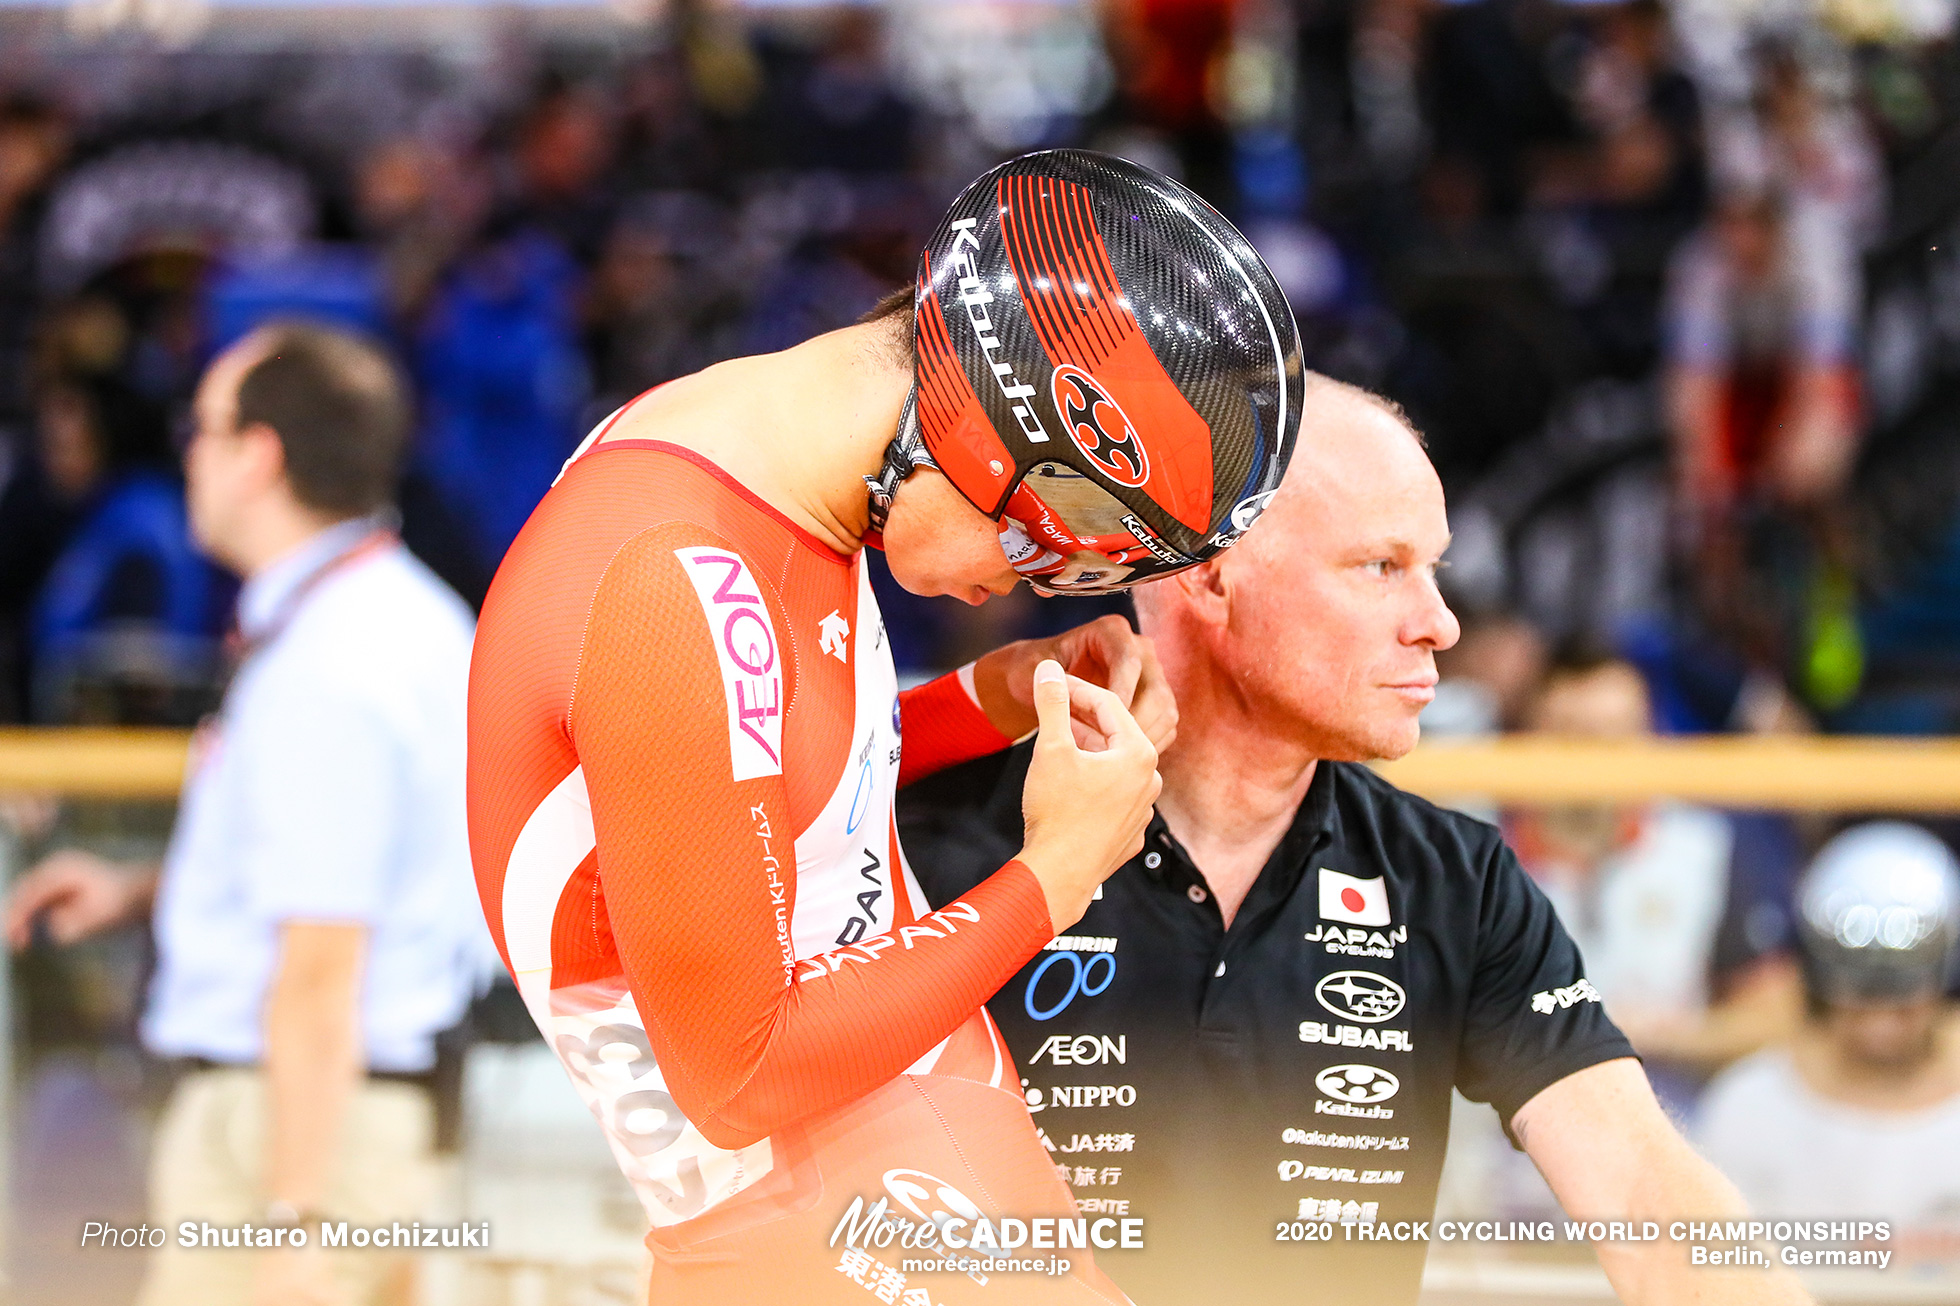 2nd Round Repechage / Men's Keirin / 2020 Track Cycling World Championships, Wakimoto Yuta 脇本雄太